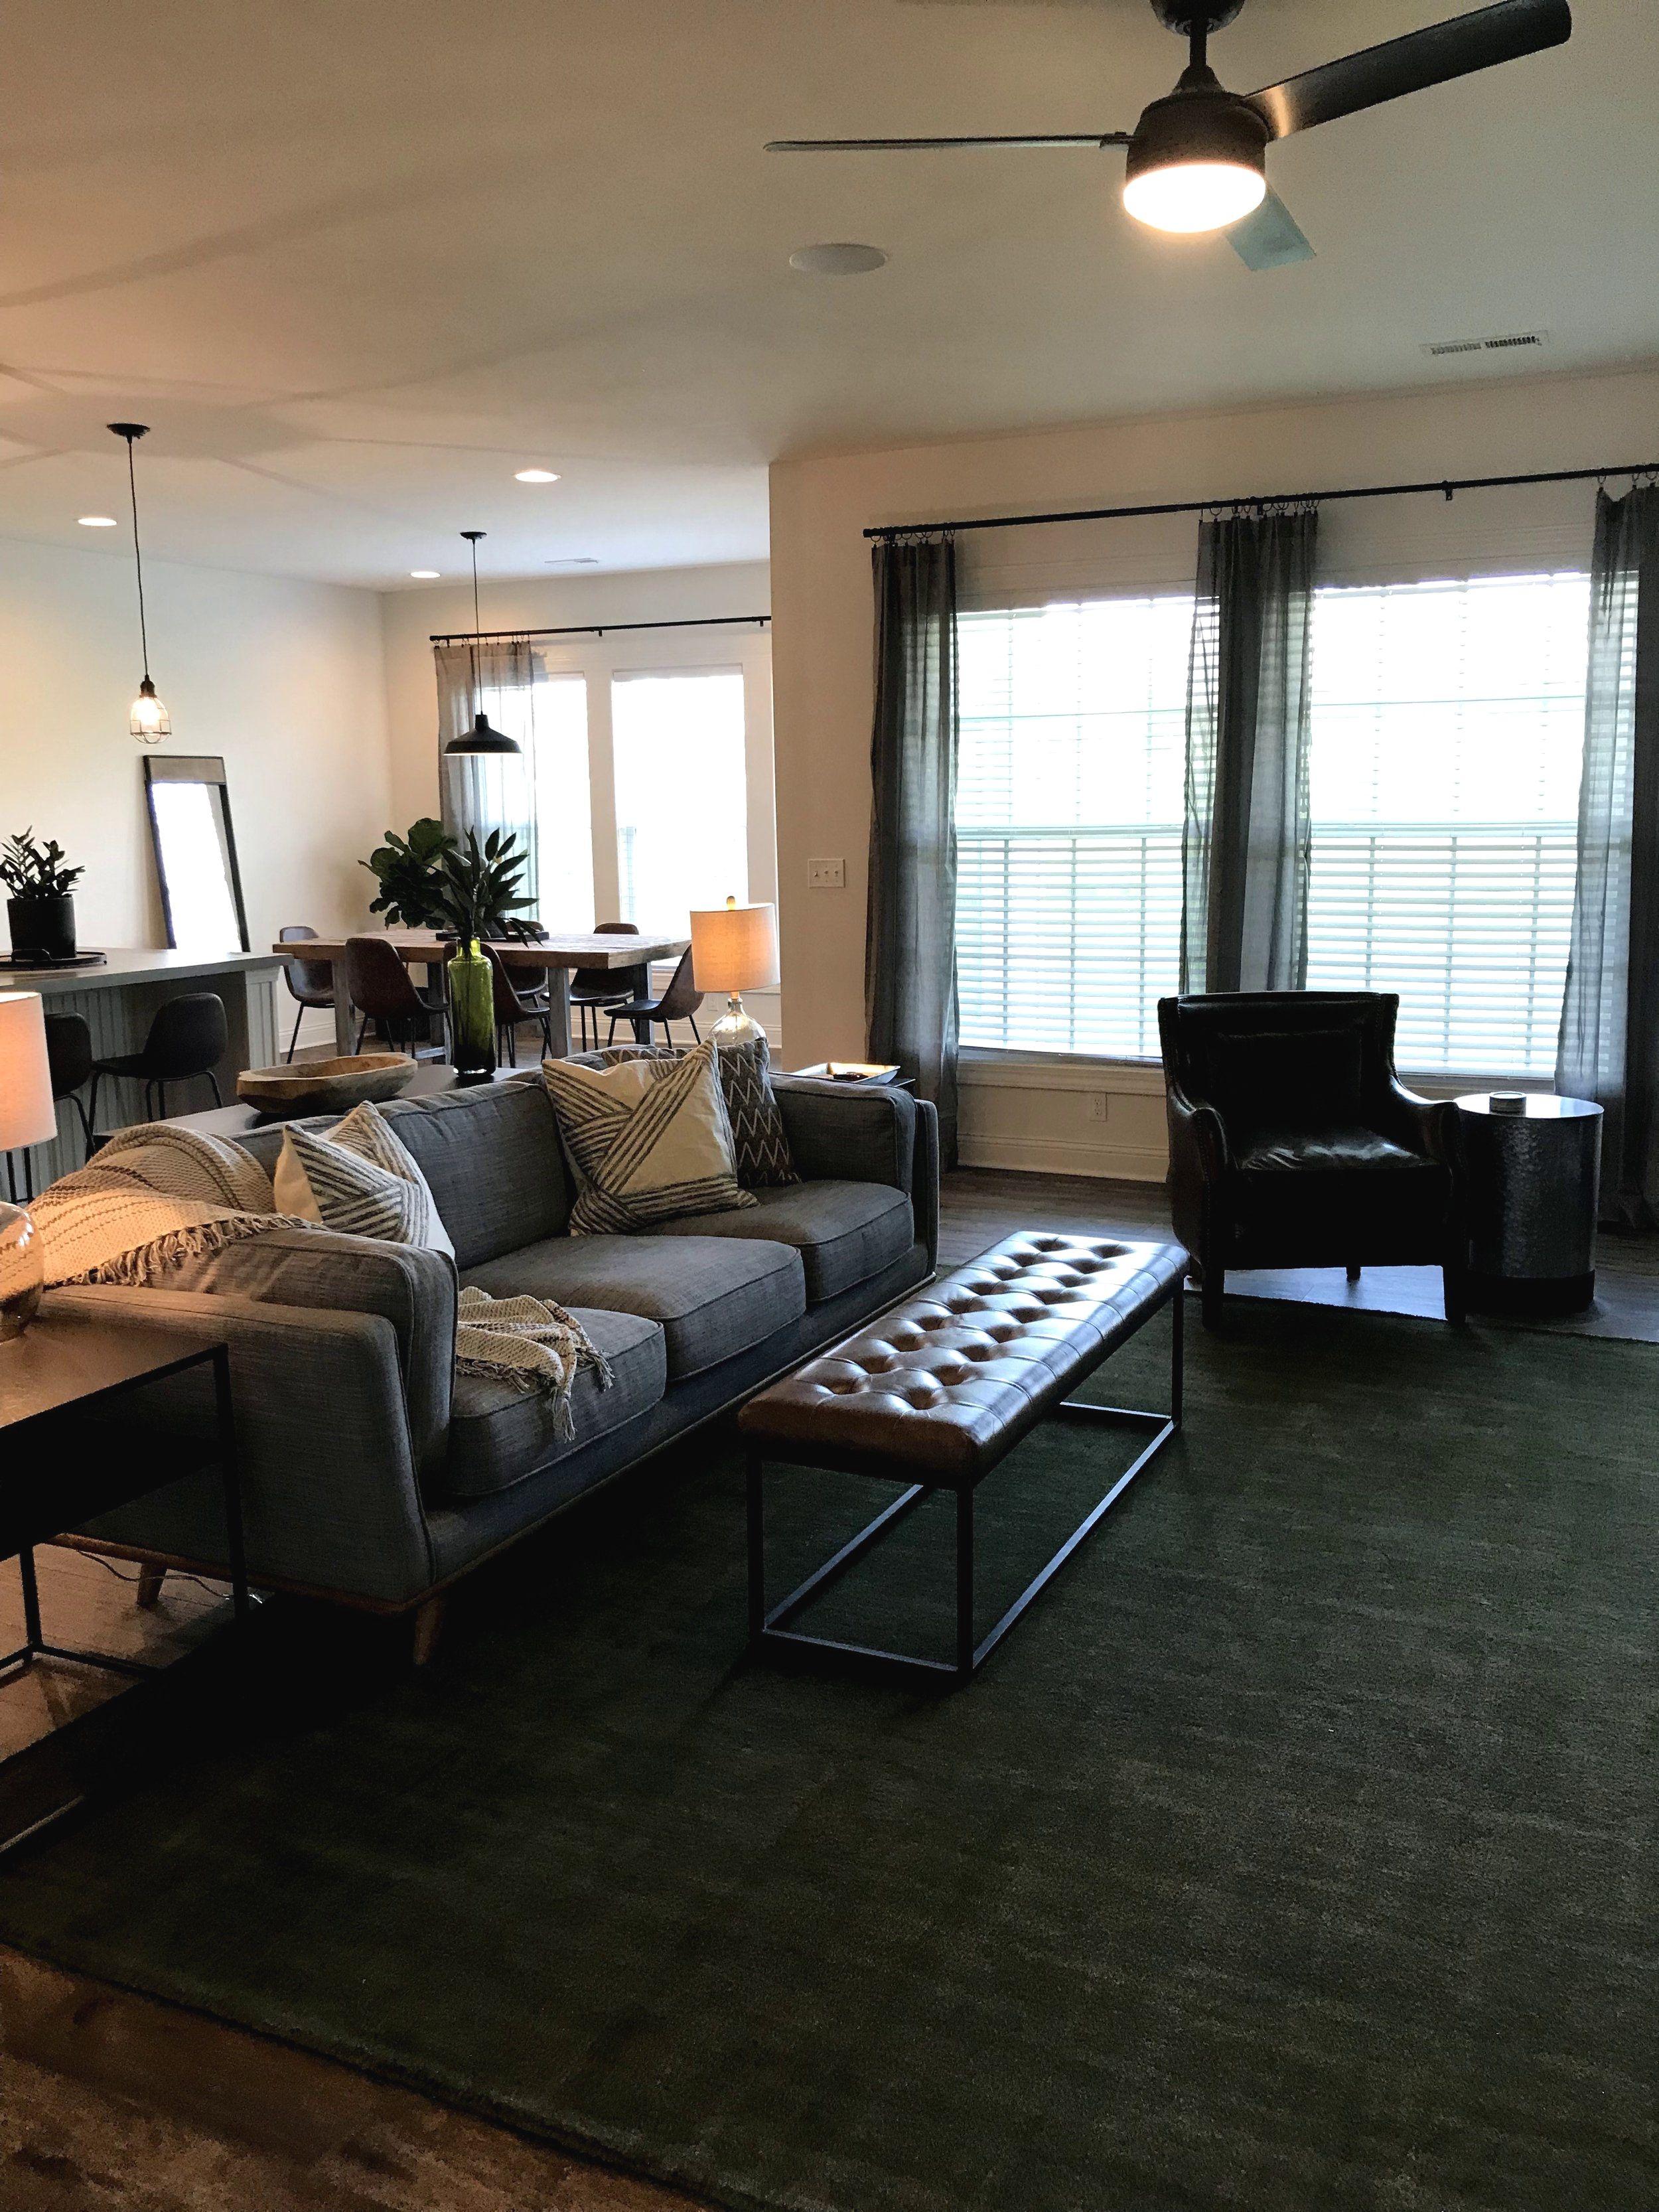 10 Amazing Small Apartment Living Room Designs